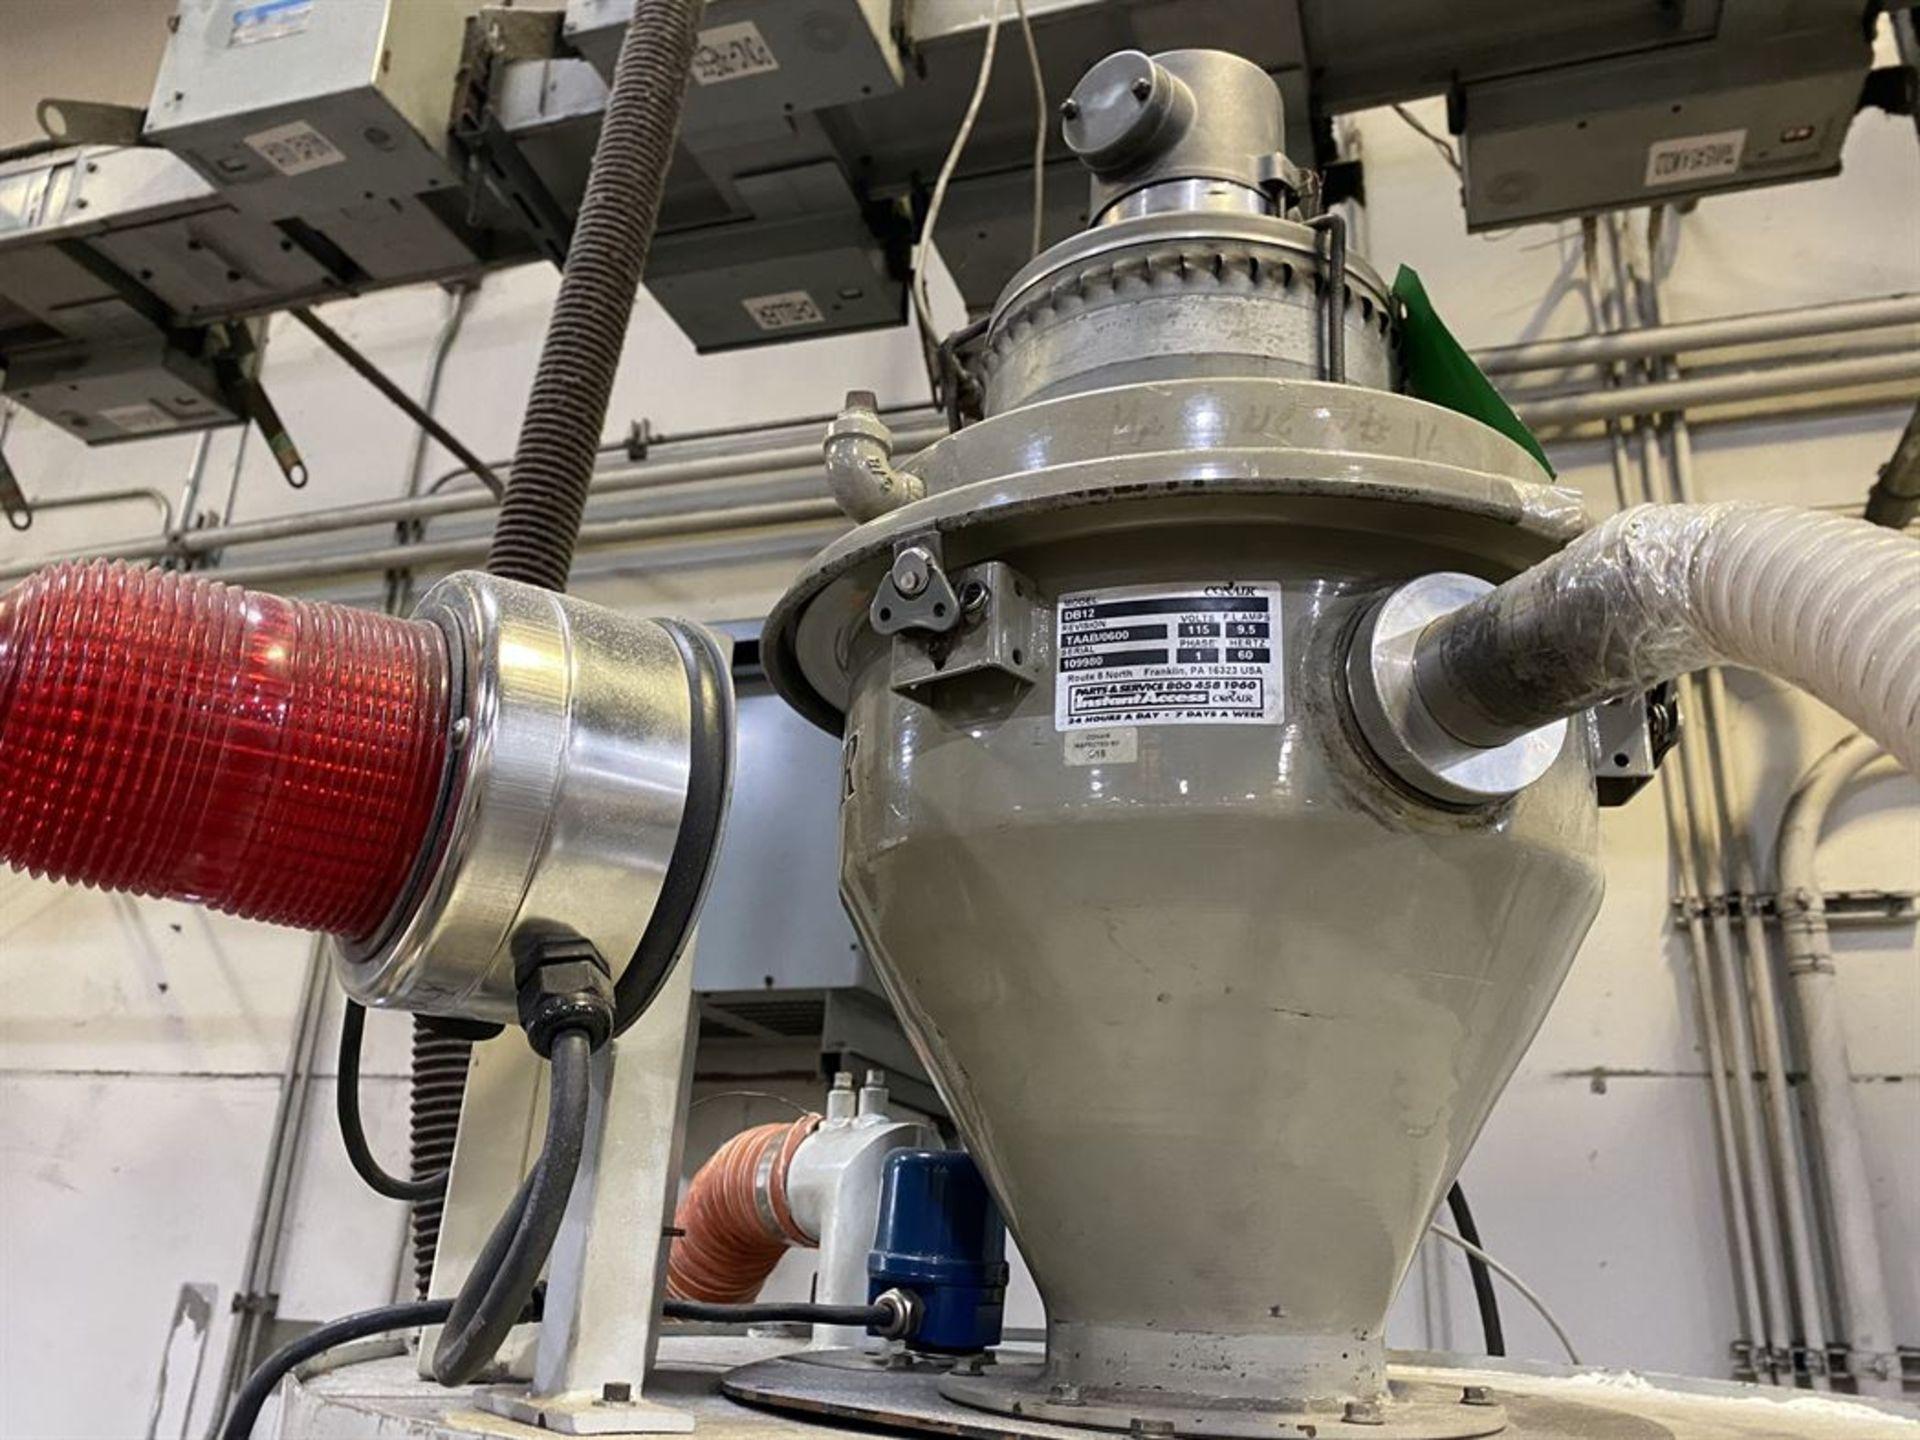 Lot 217 - Conair Franklin DBAA04S030000 Hopper Dryer System, s/n D51082, Cincinnati Milacron Hopper, Conair